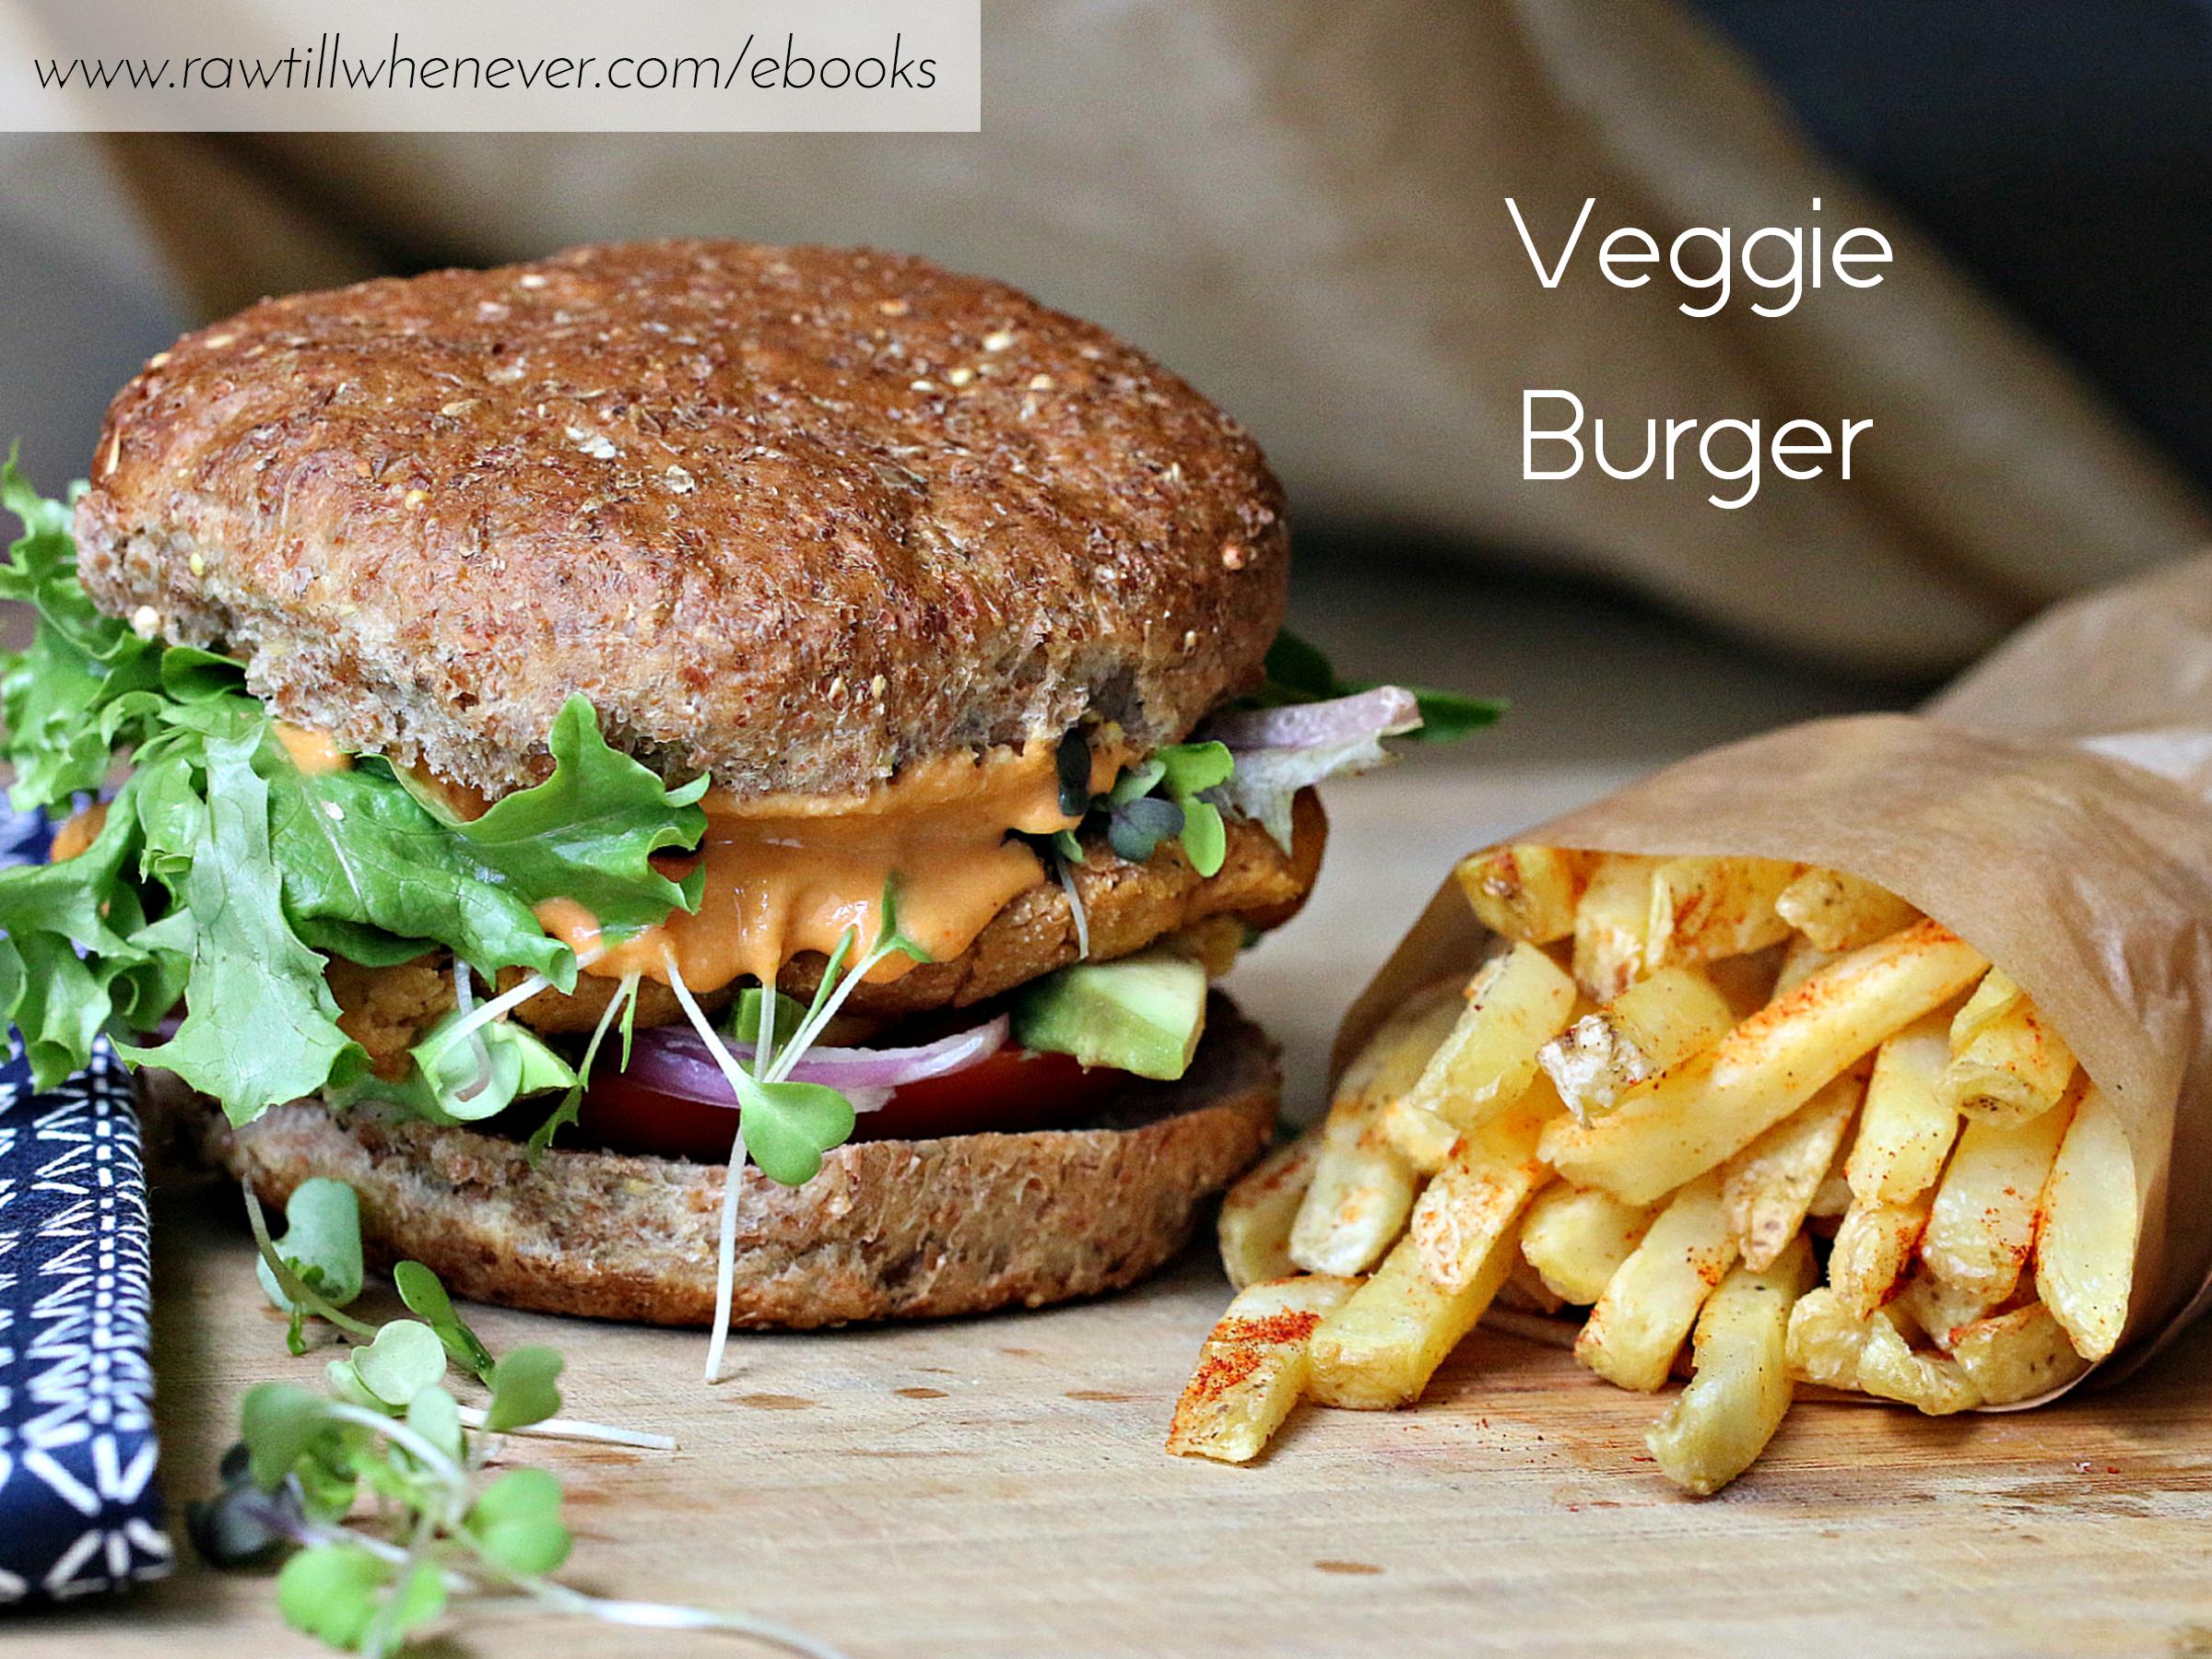 Veggie burger recipe featured from my best selling vegan recipe book veggie burger recipe featured from my best selling vegan recipe book fullycooked forumfinder Choice Image